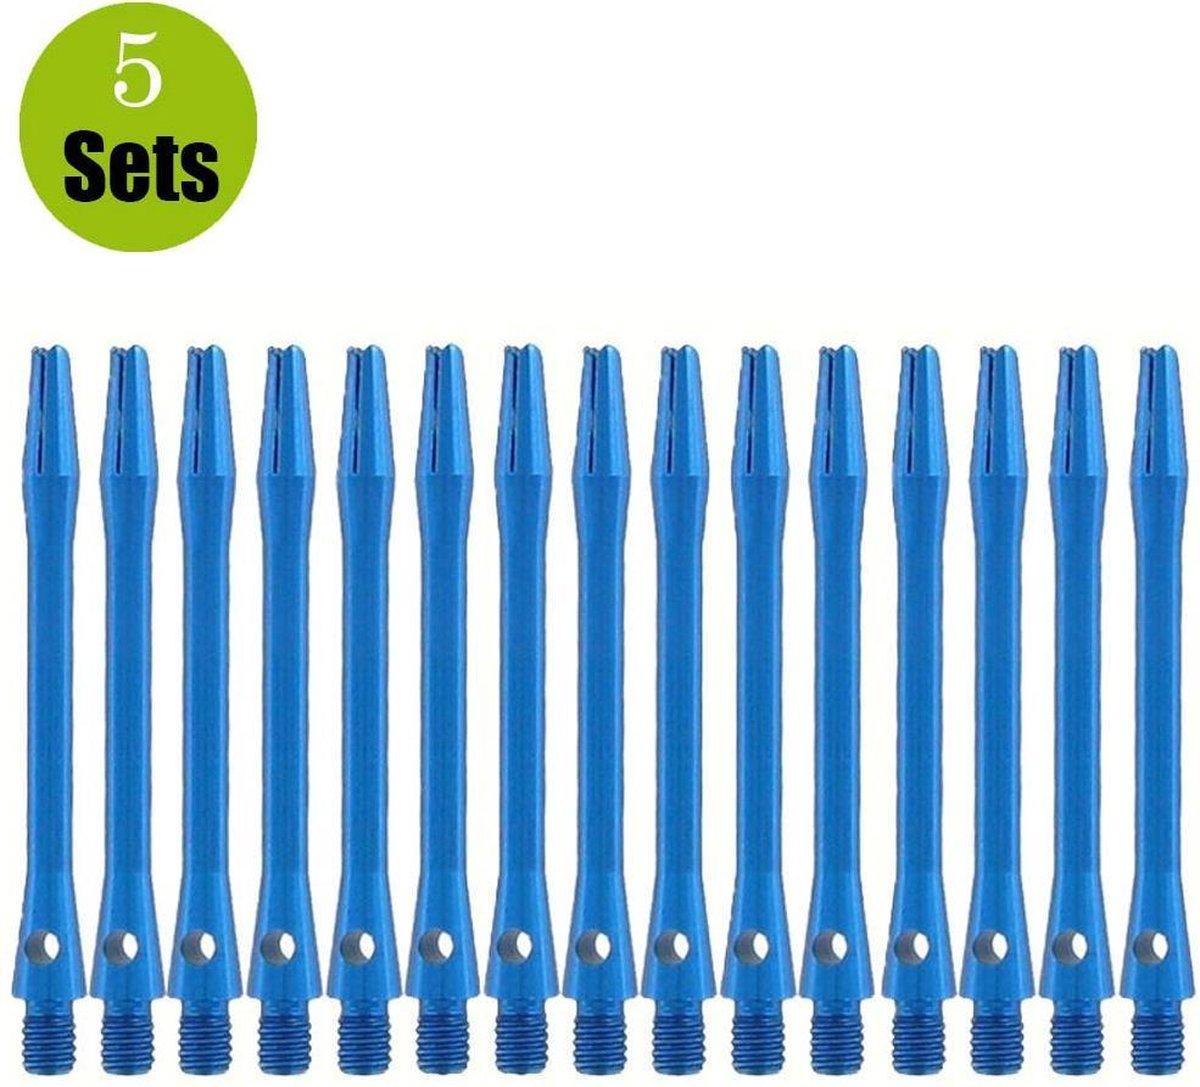 Aluminium Dart Shafts - Blauw - Short - (5 Sets)